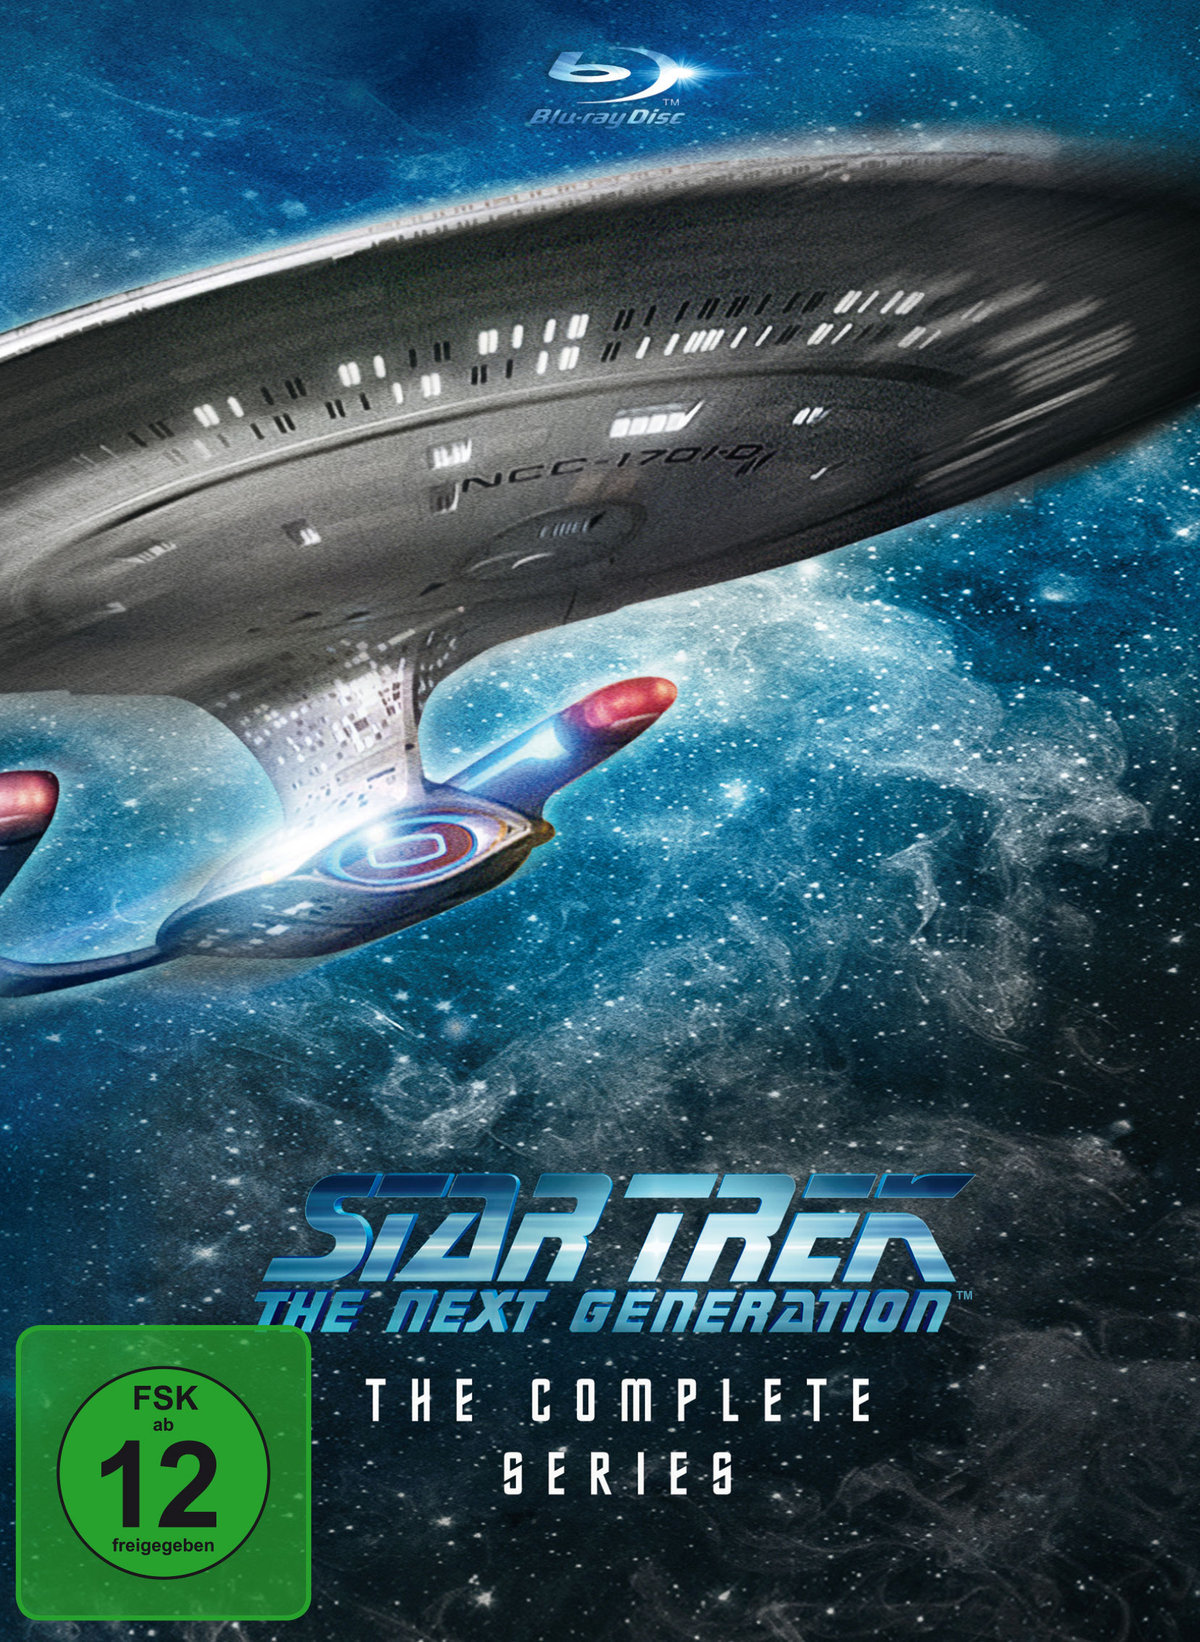 Star Trek - The Next Generation - The Complete Series (41 Blu-rays)